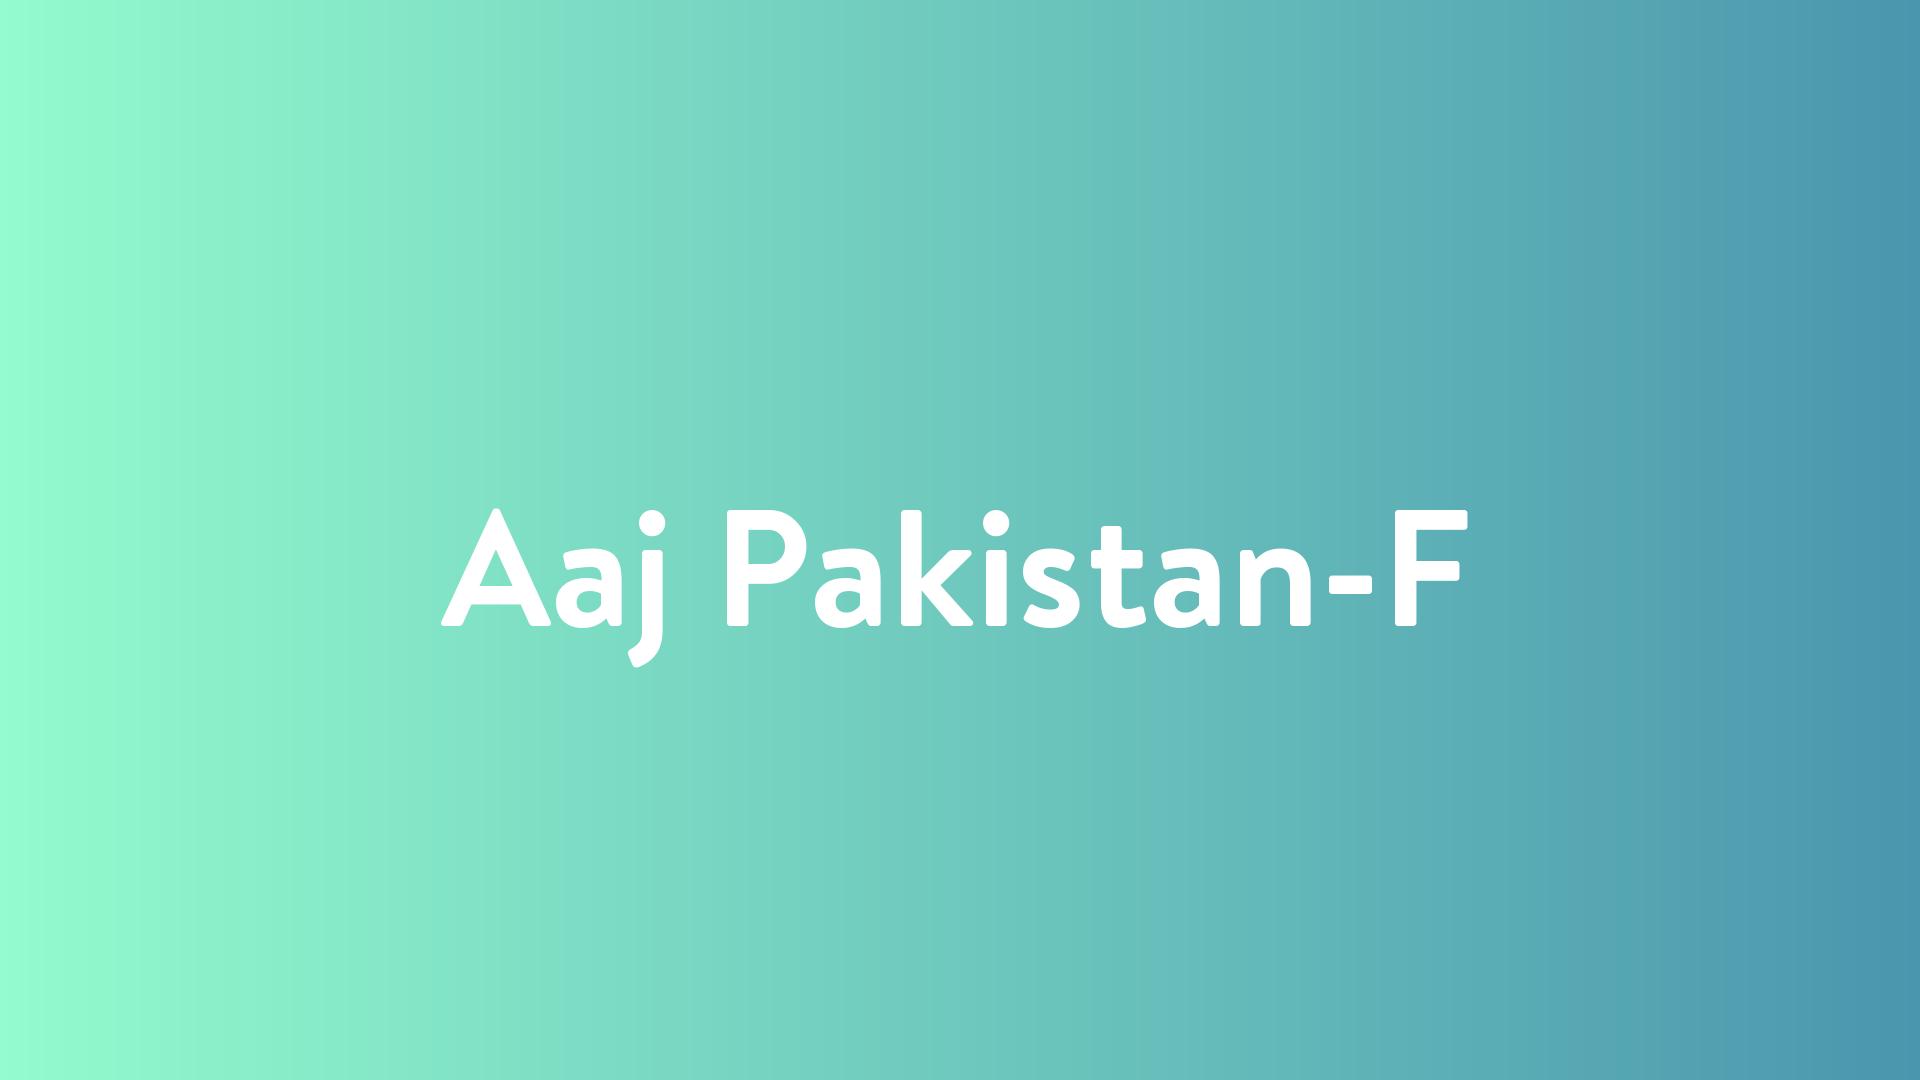 Stream And Watch Aaj Pakistan-F Online | Sling TV